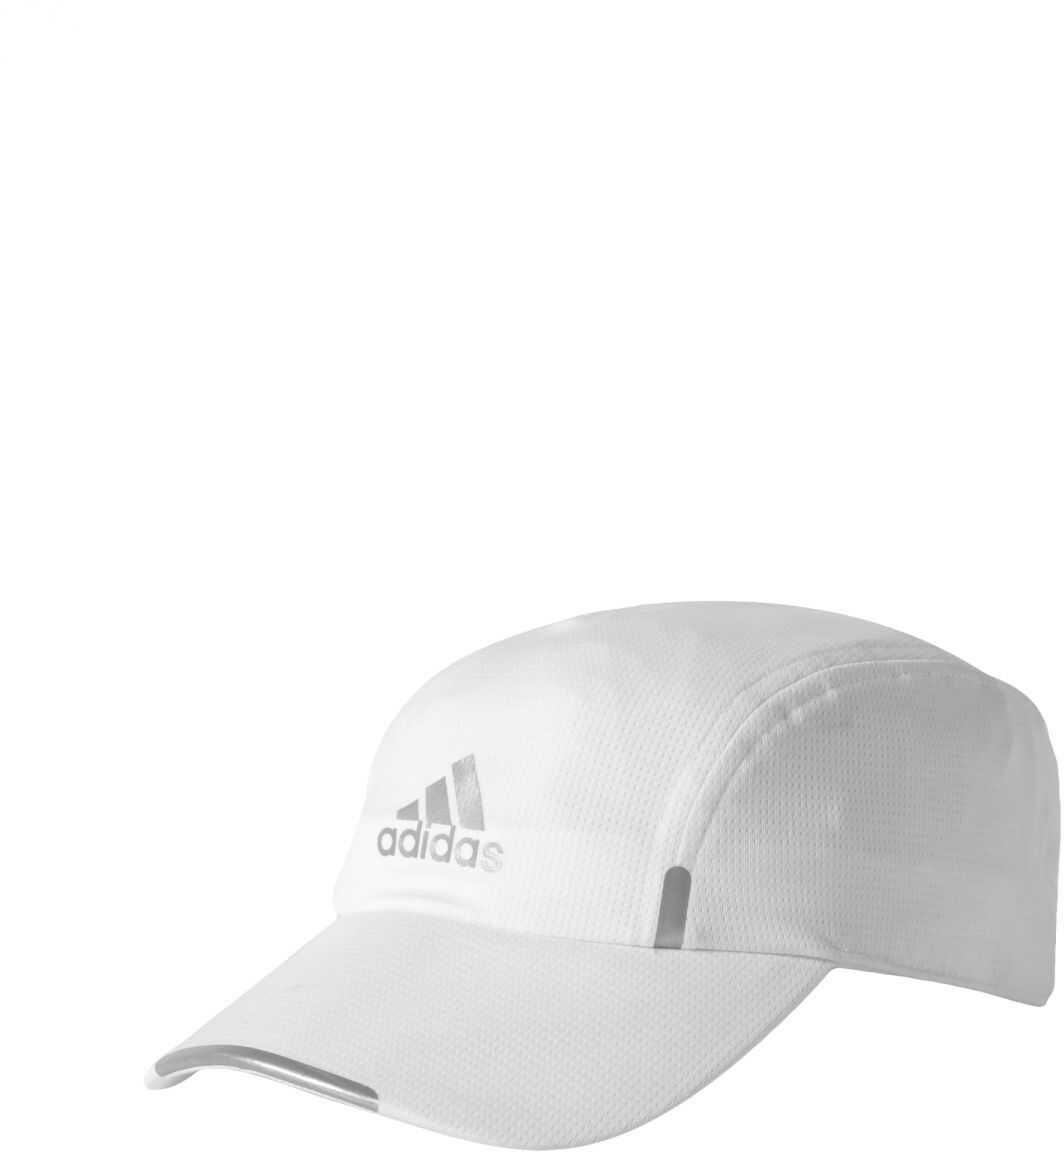 adidas RUN CLMCO WHITE/REFSIL/REFSIL